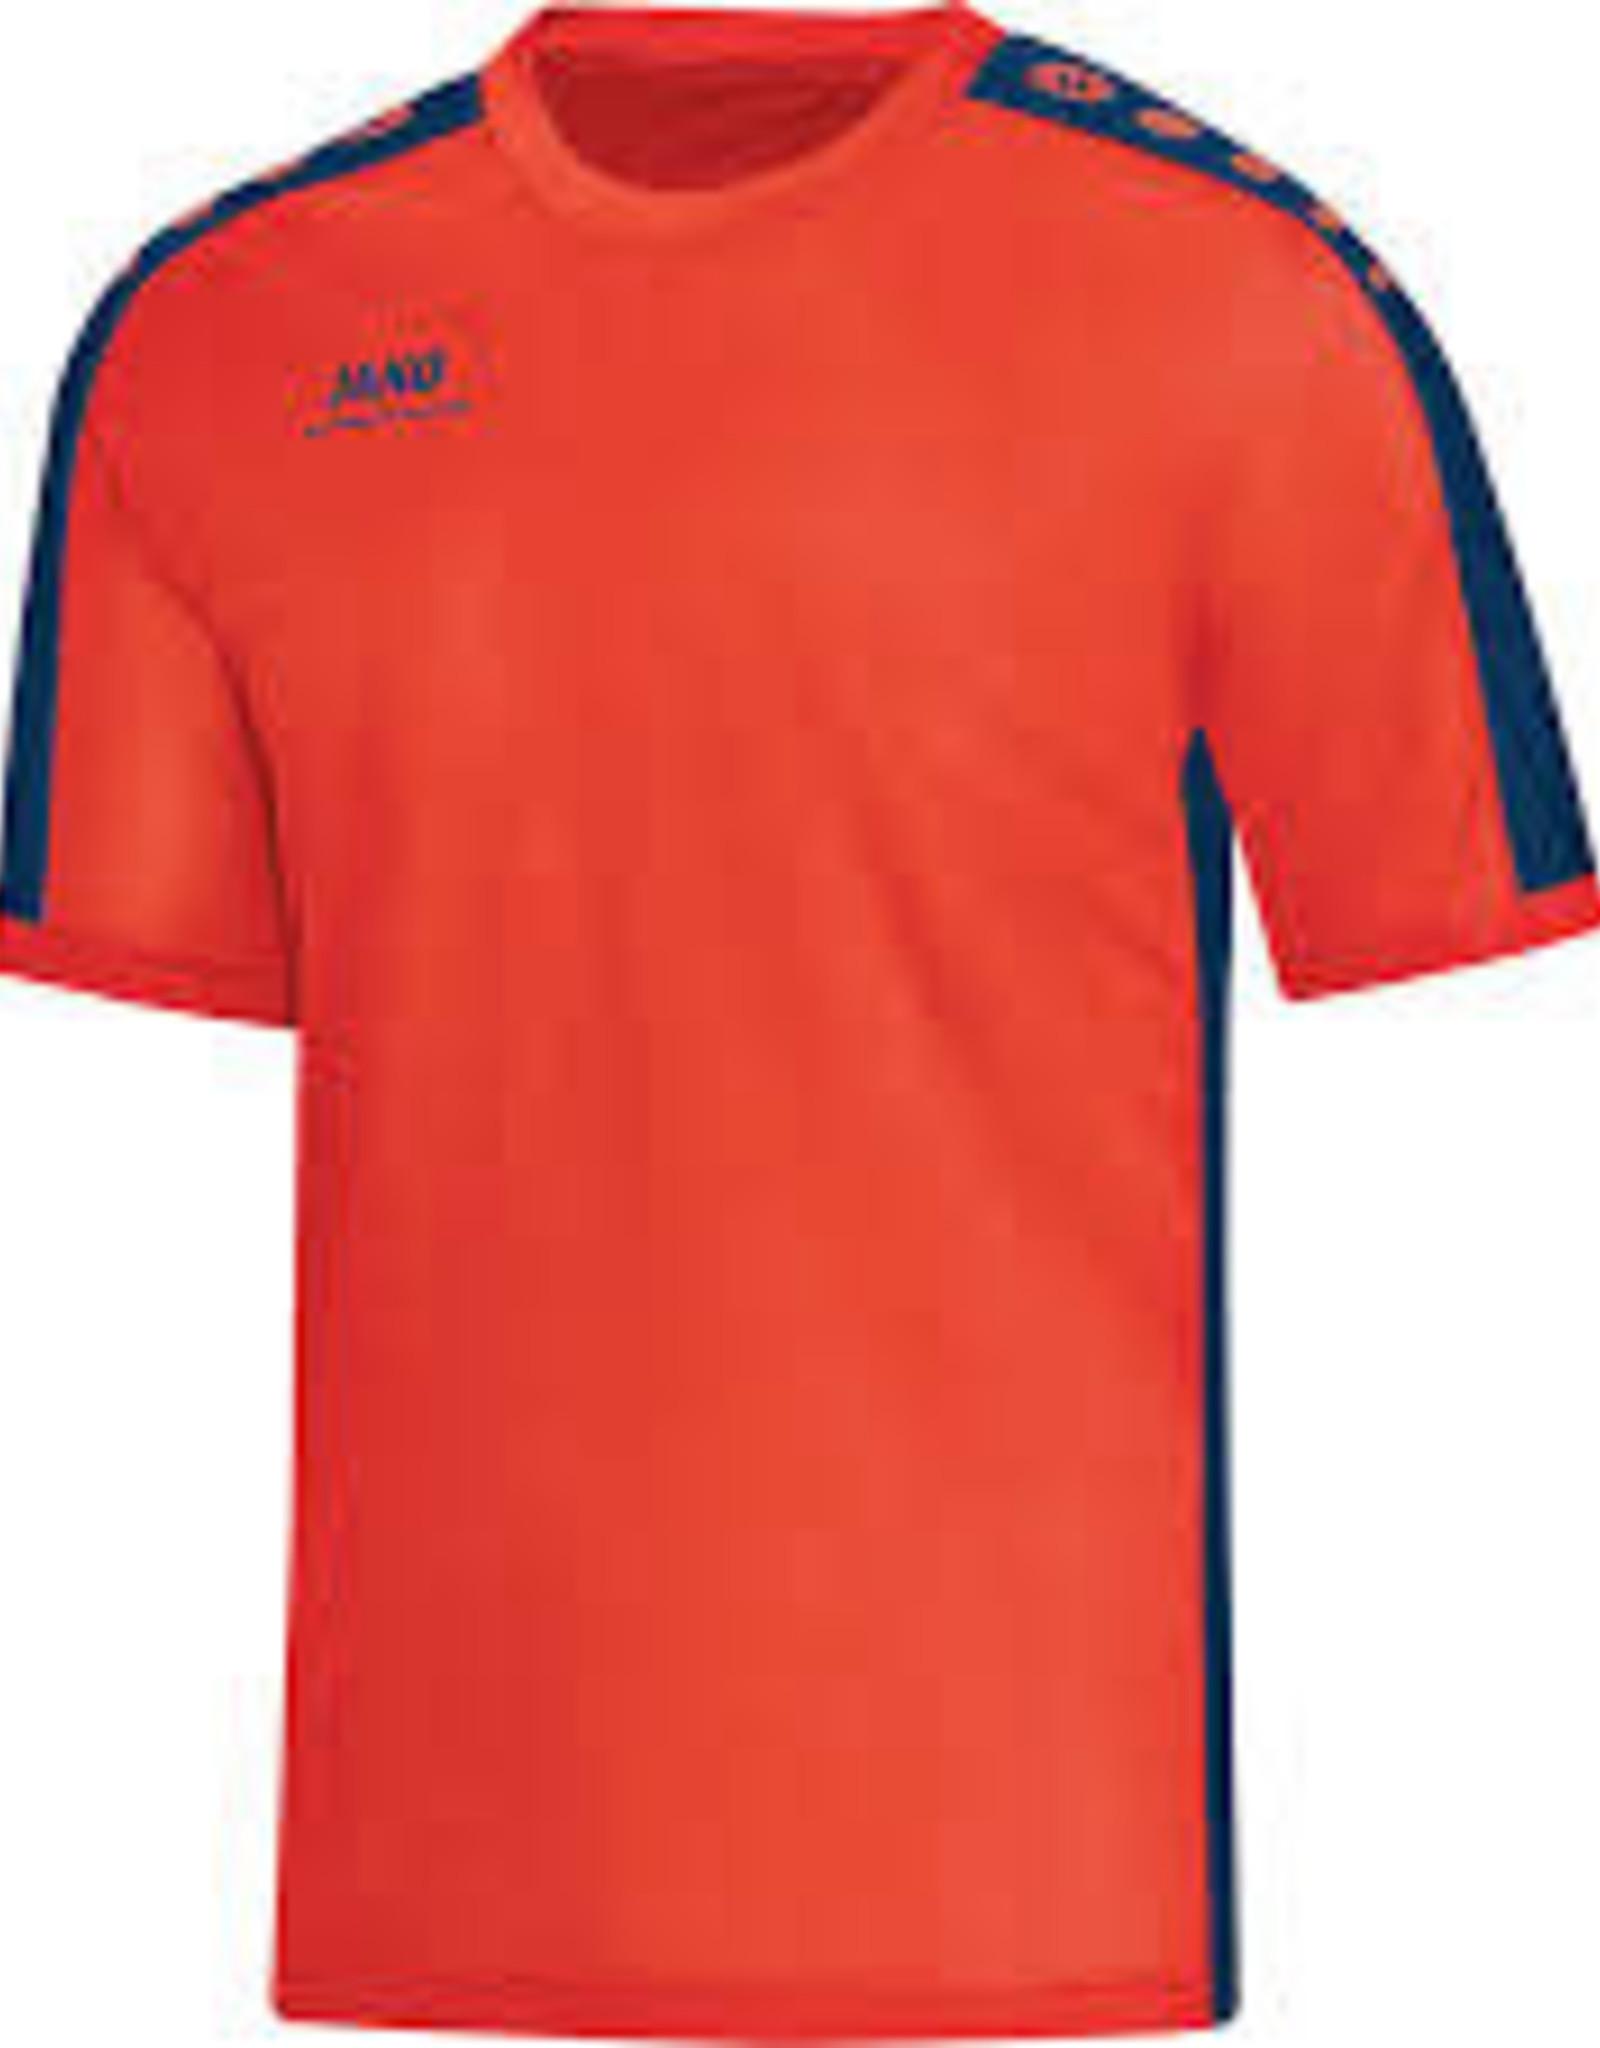 Jako T-shirt Striker sr